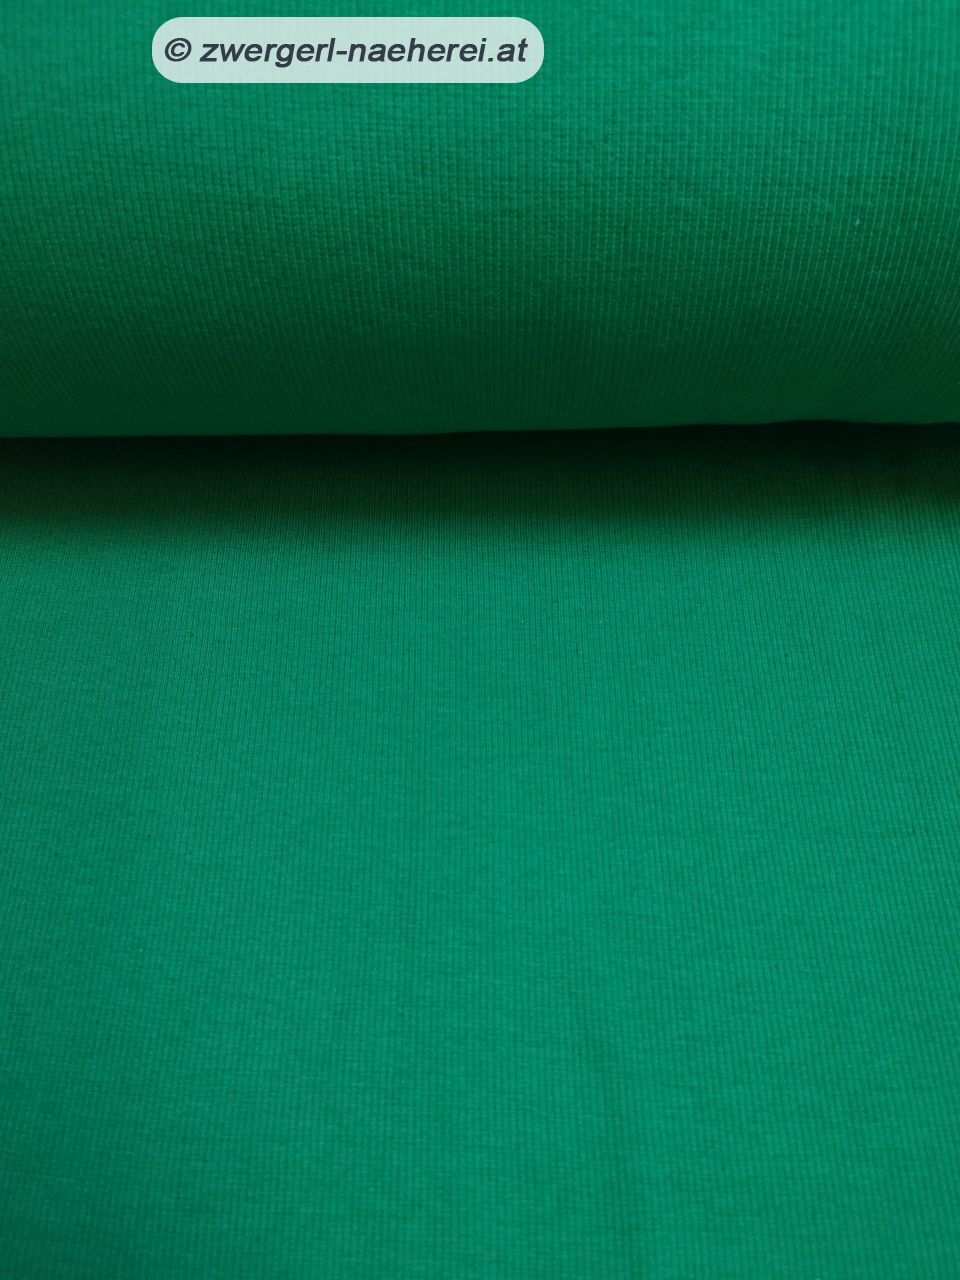 Stoff-Baumwolle-Jersey-Bündchen-Fleece_008